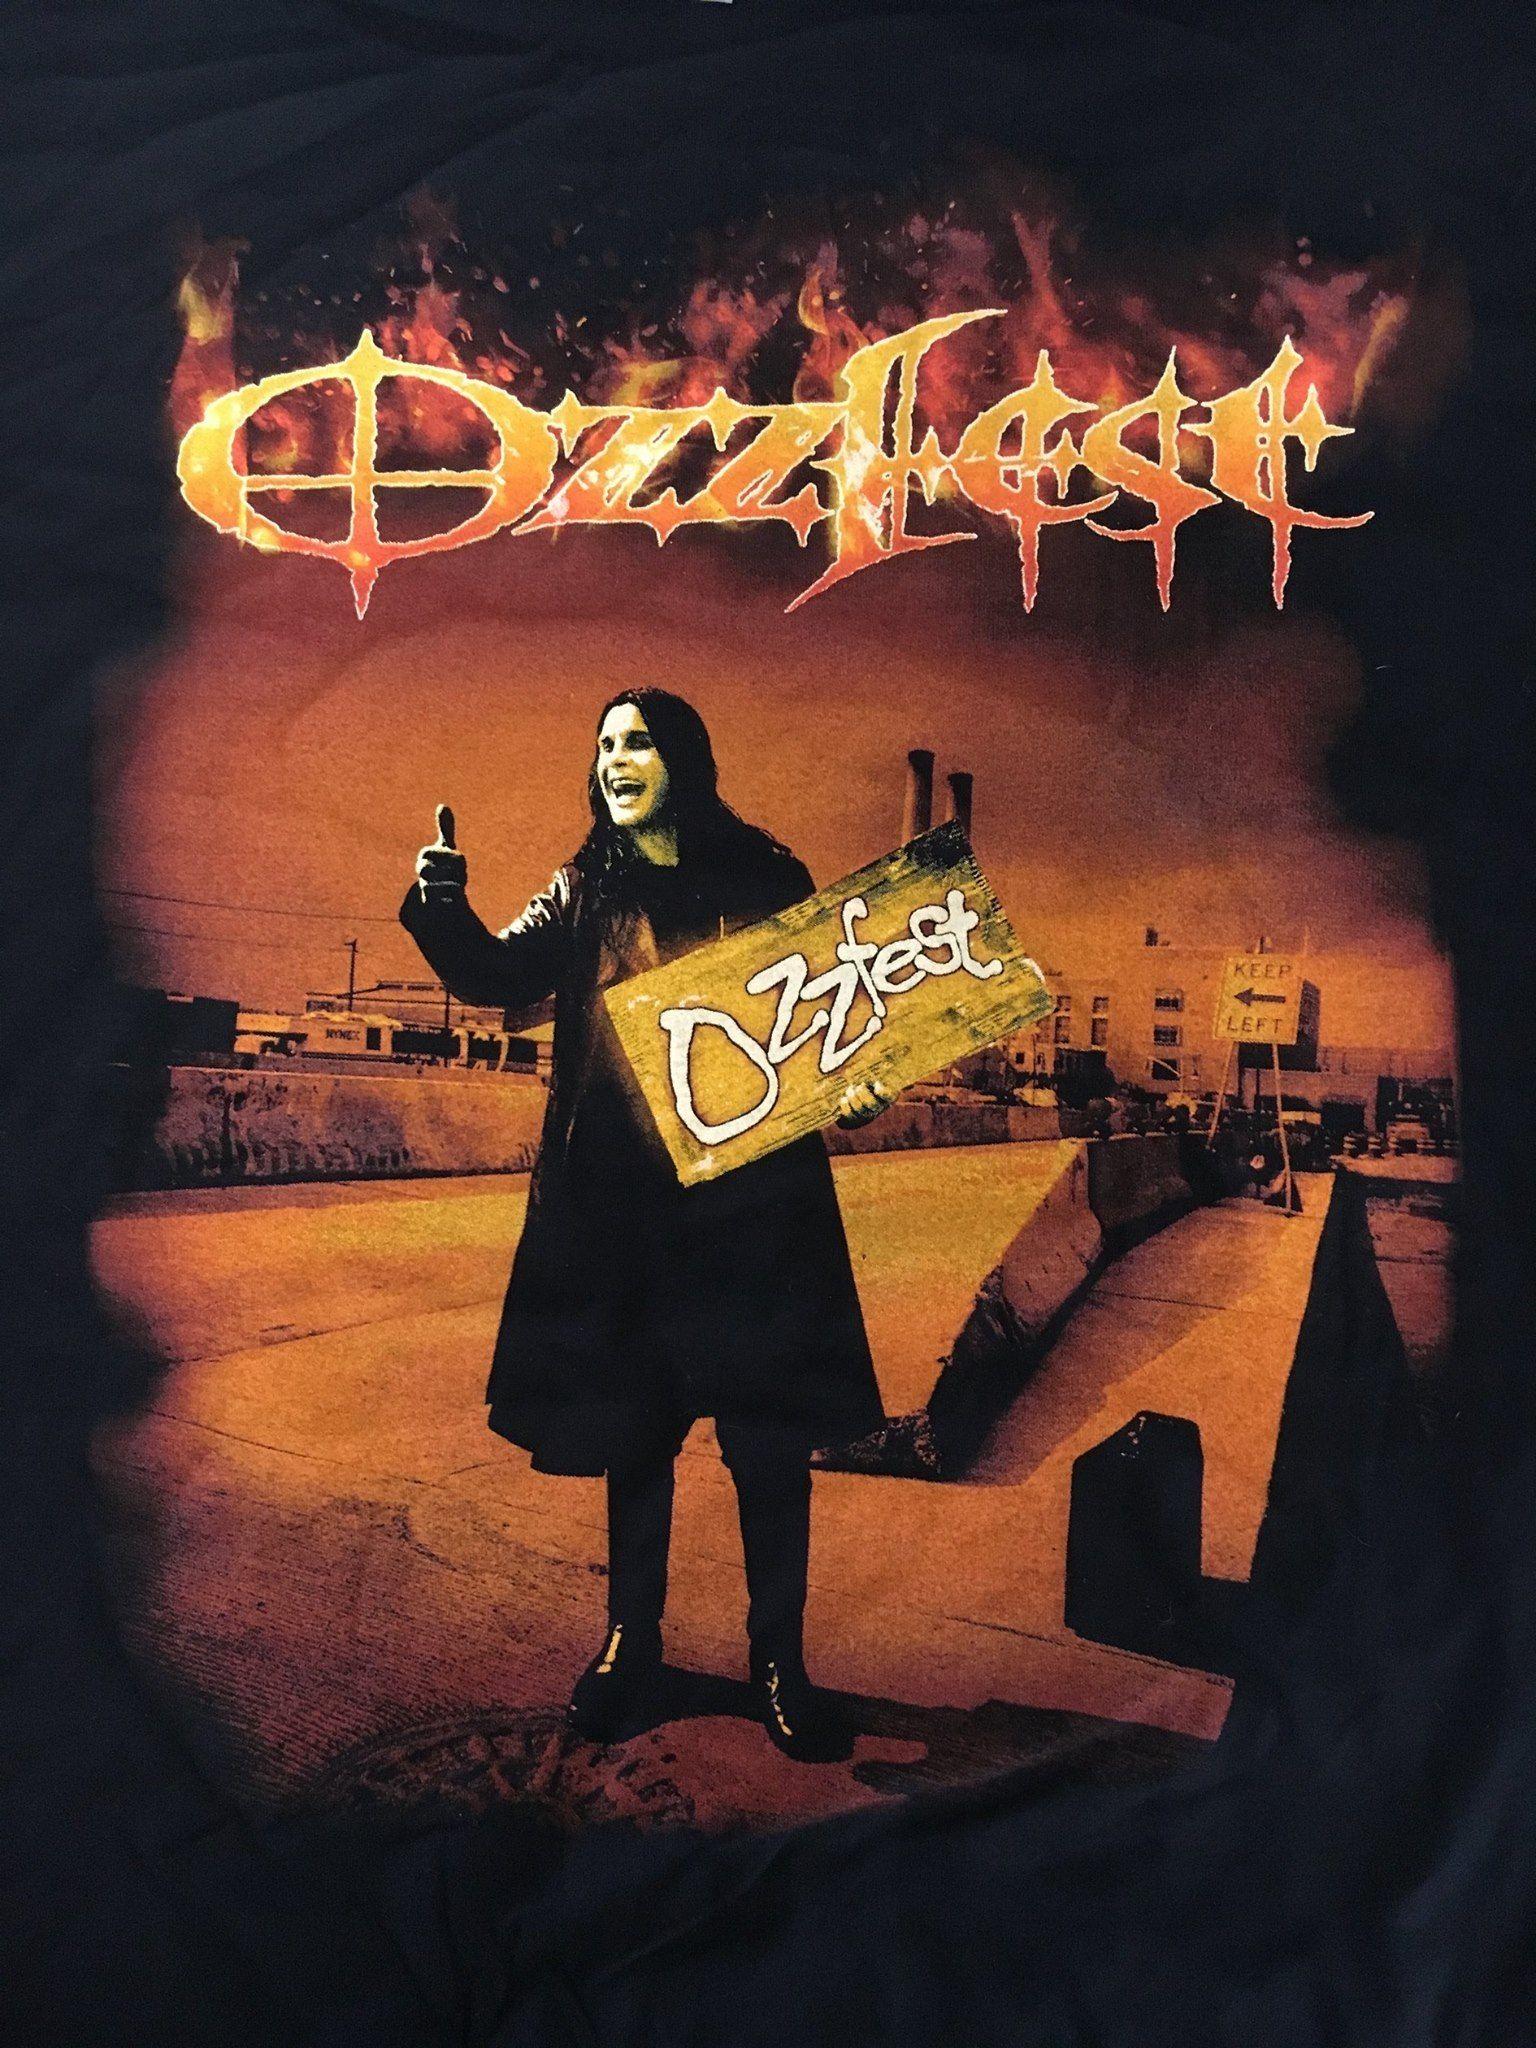 Ozzfest Metal Festival 2019